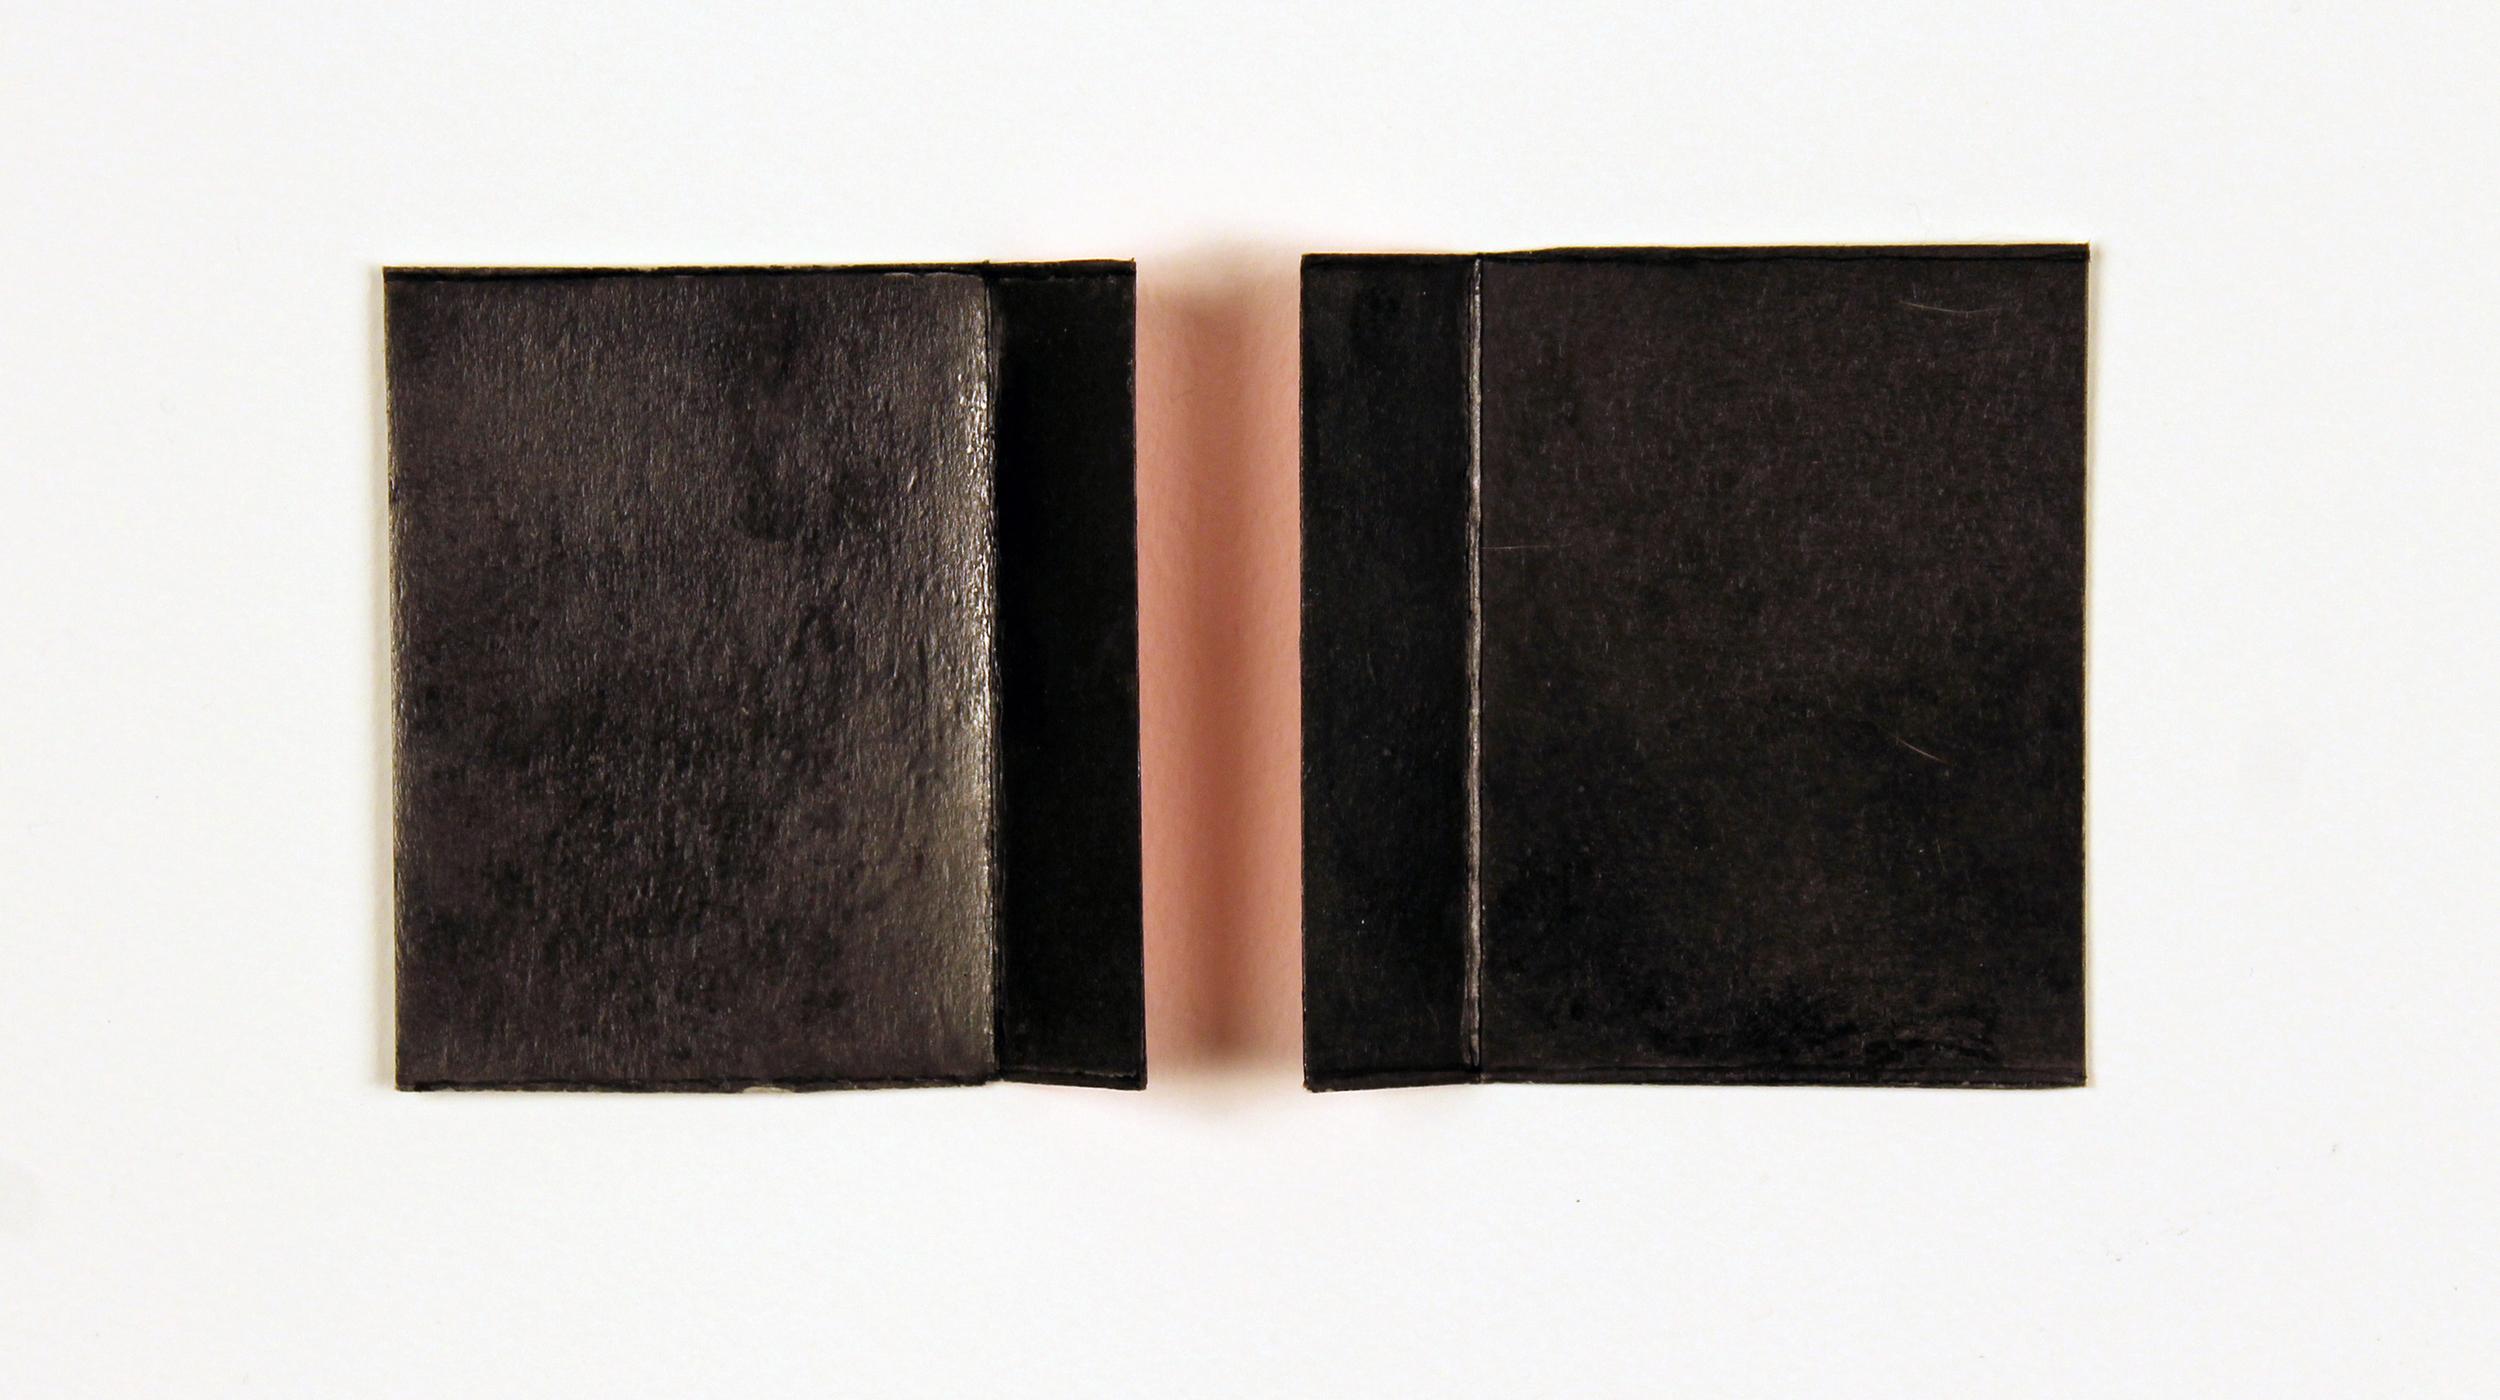 "Chroma (Red for Derek Jarman)  Graphite powder, silkscreened pigment, archival wax on cardboard, 12.25"" x 15.25"" (framed), 2013"